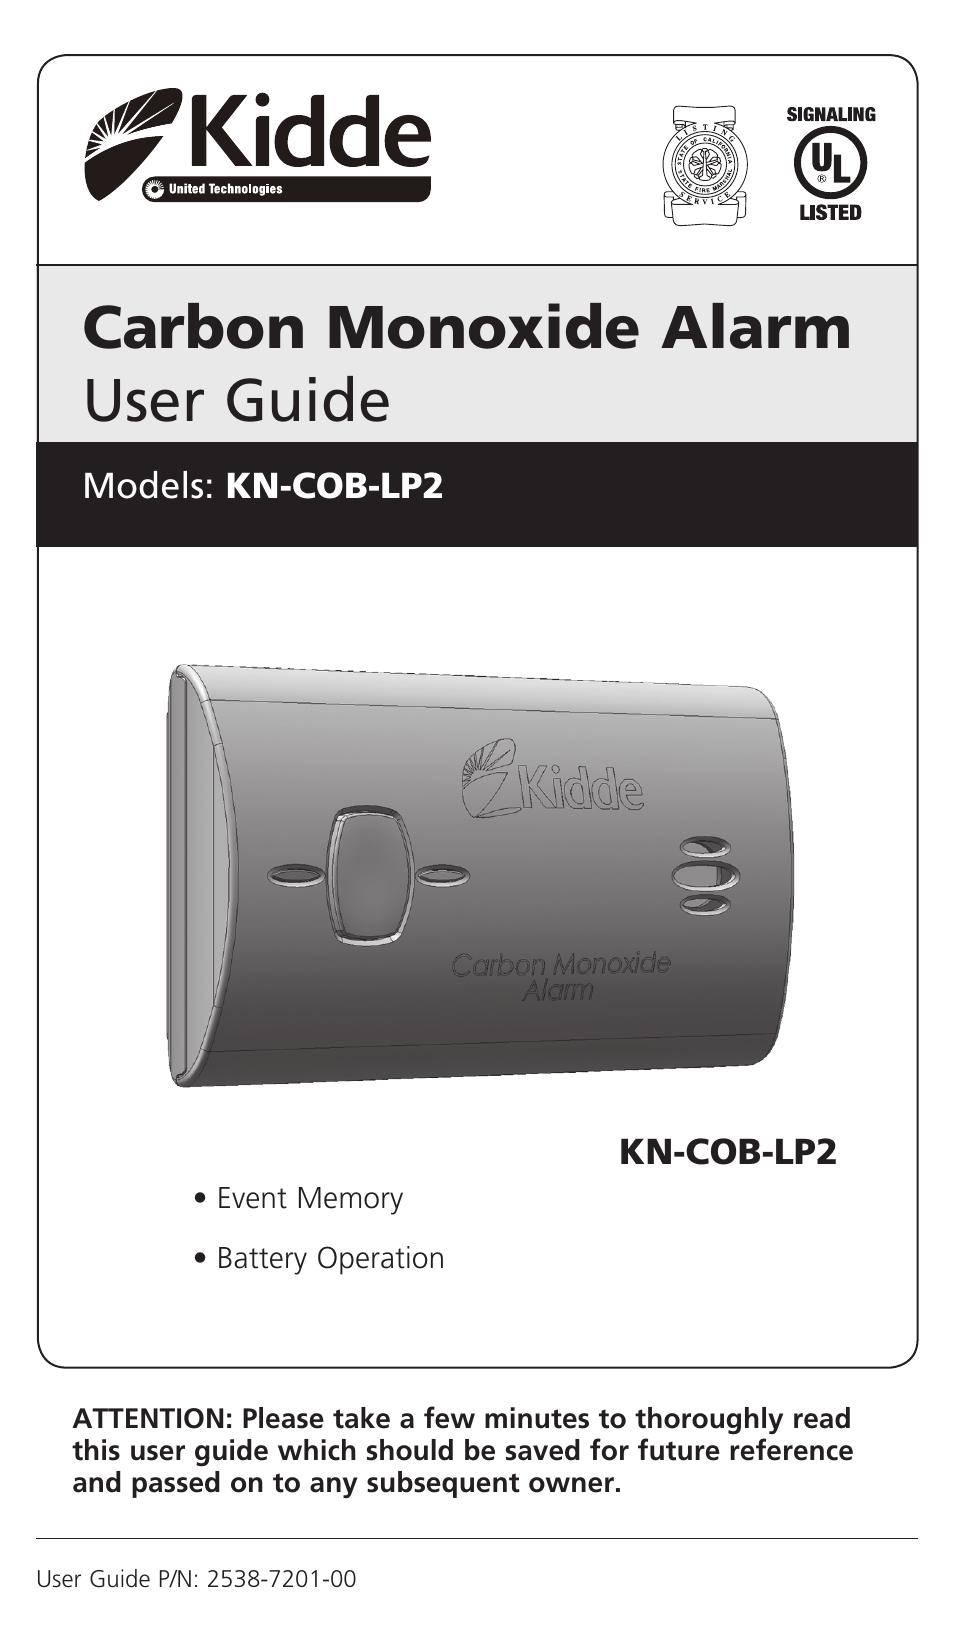 kidde carbon monoxide alarm manual